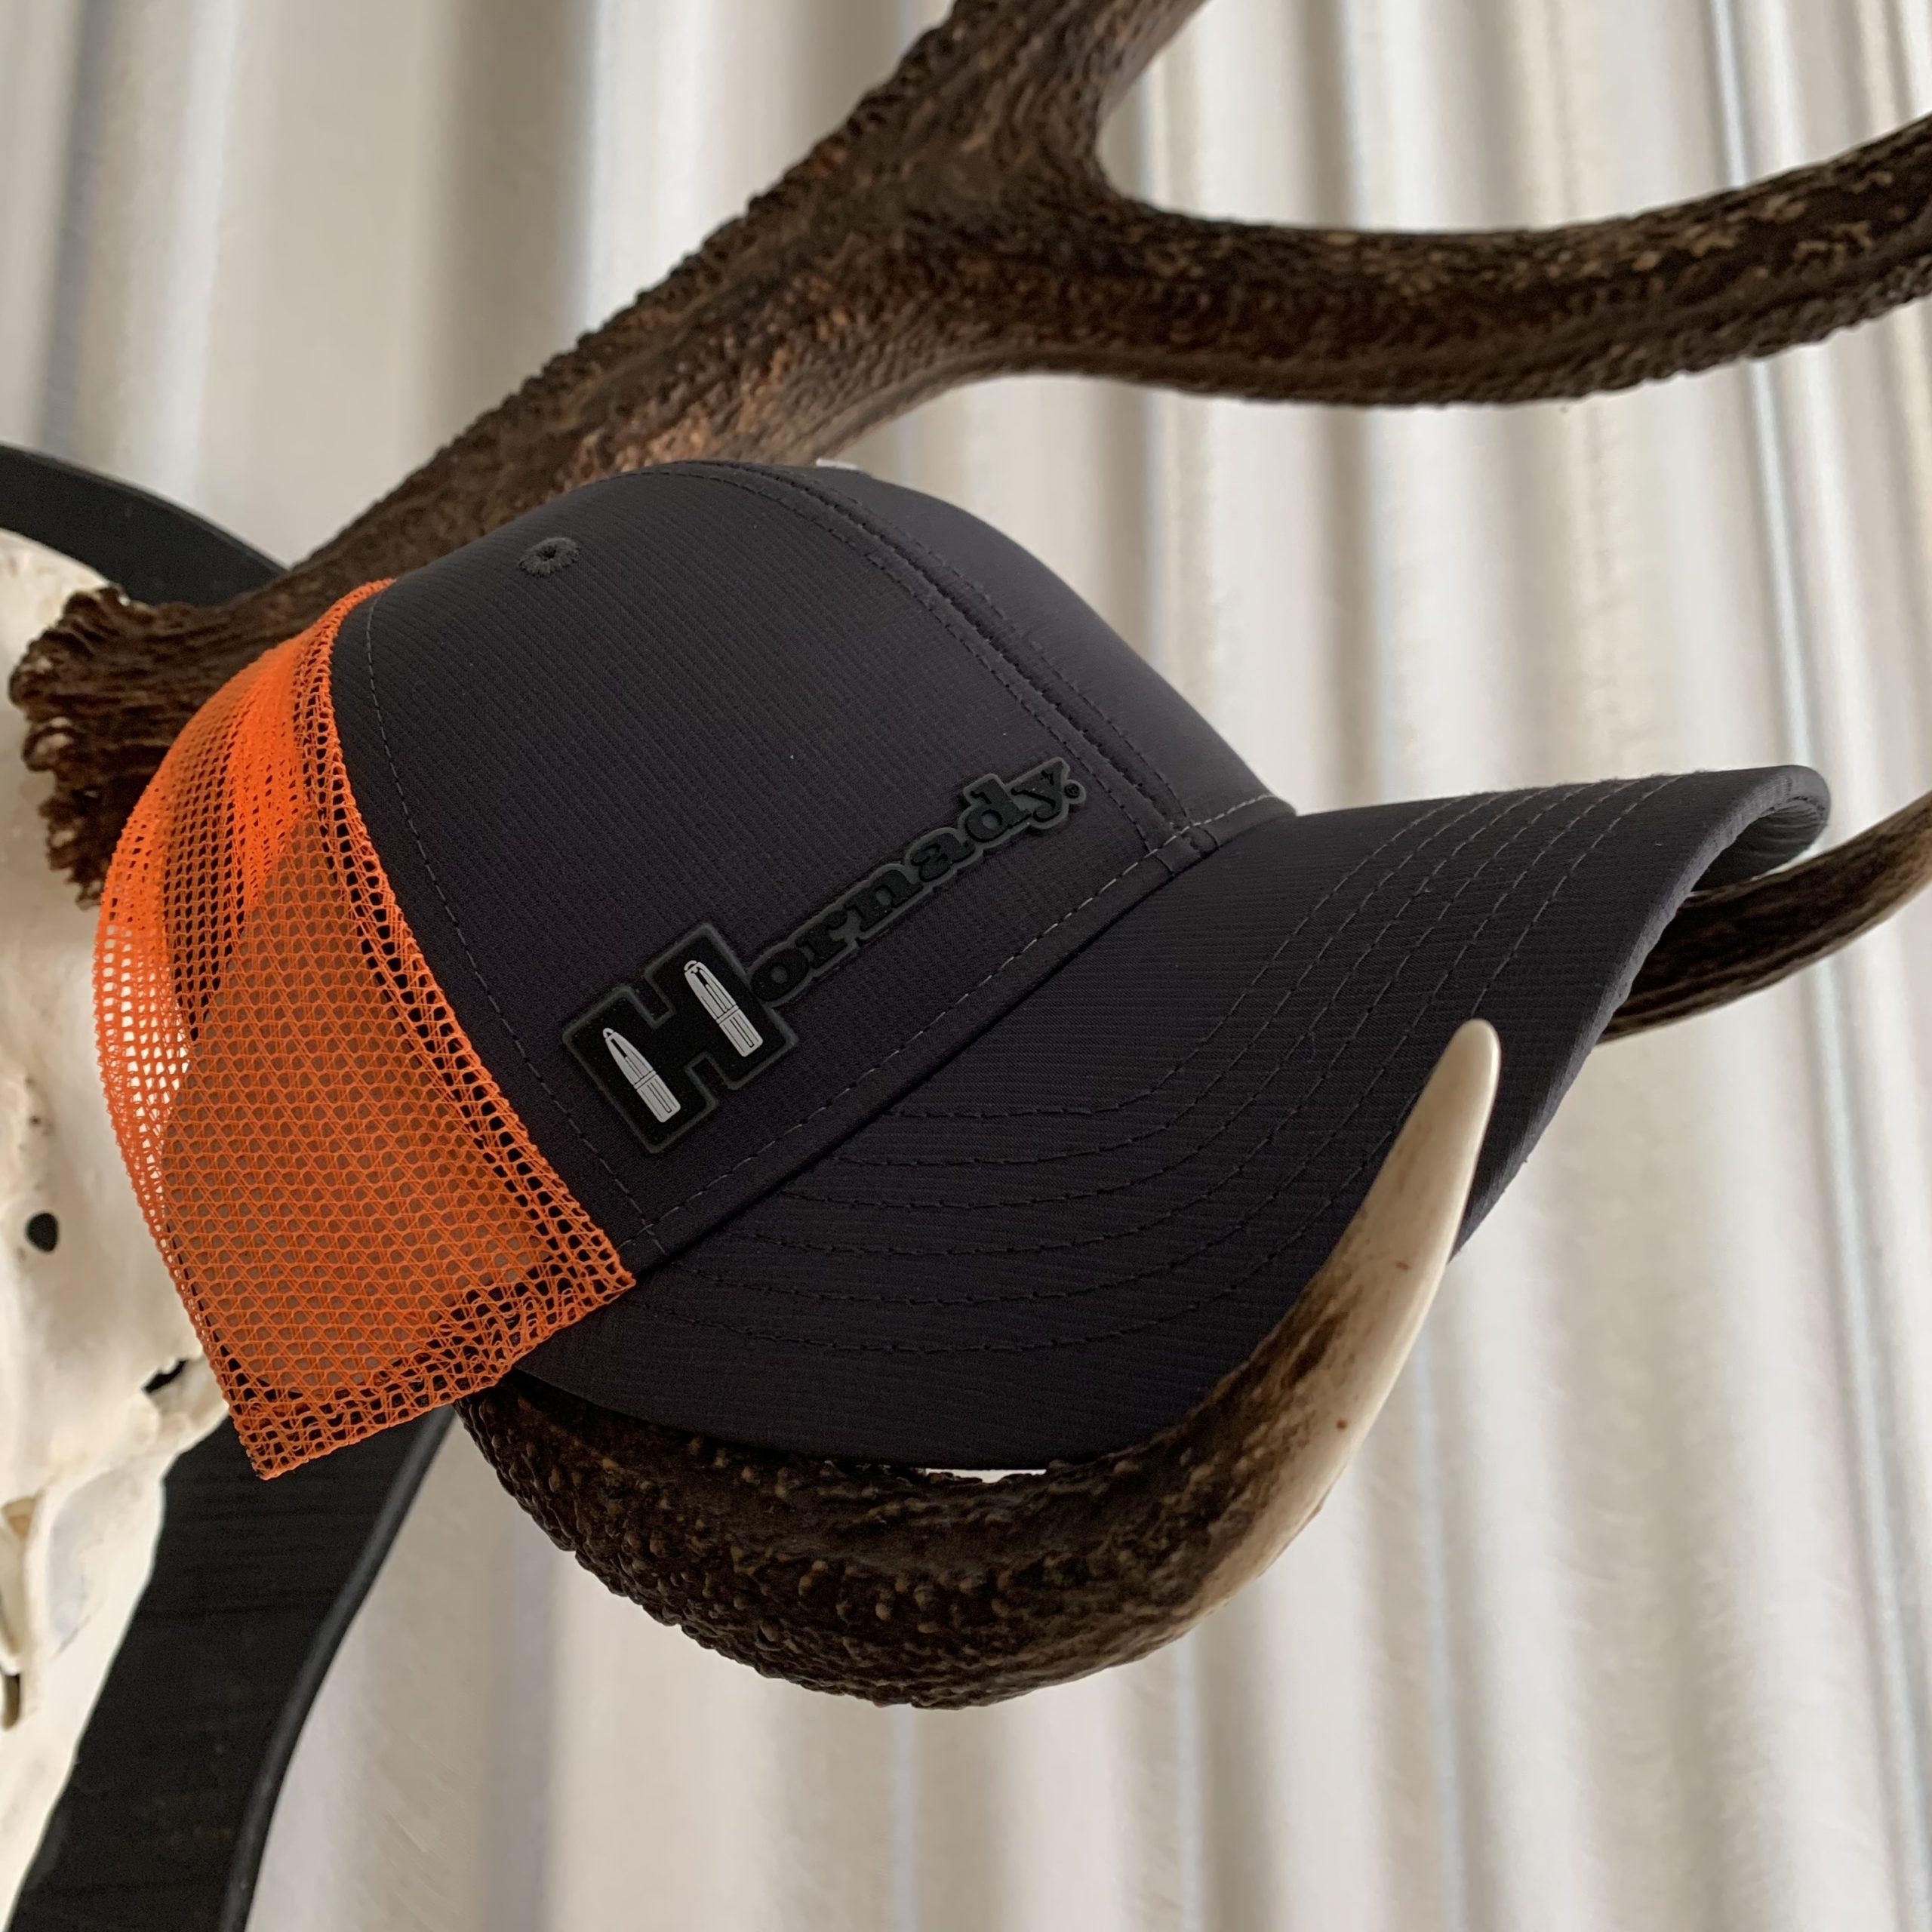 Hornady Base Cap Black Orange Sniper Mesh Cap Special Edition Hornady Gear